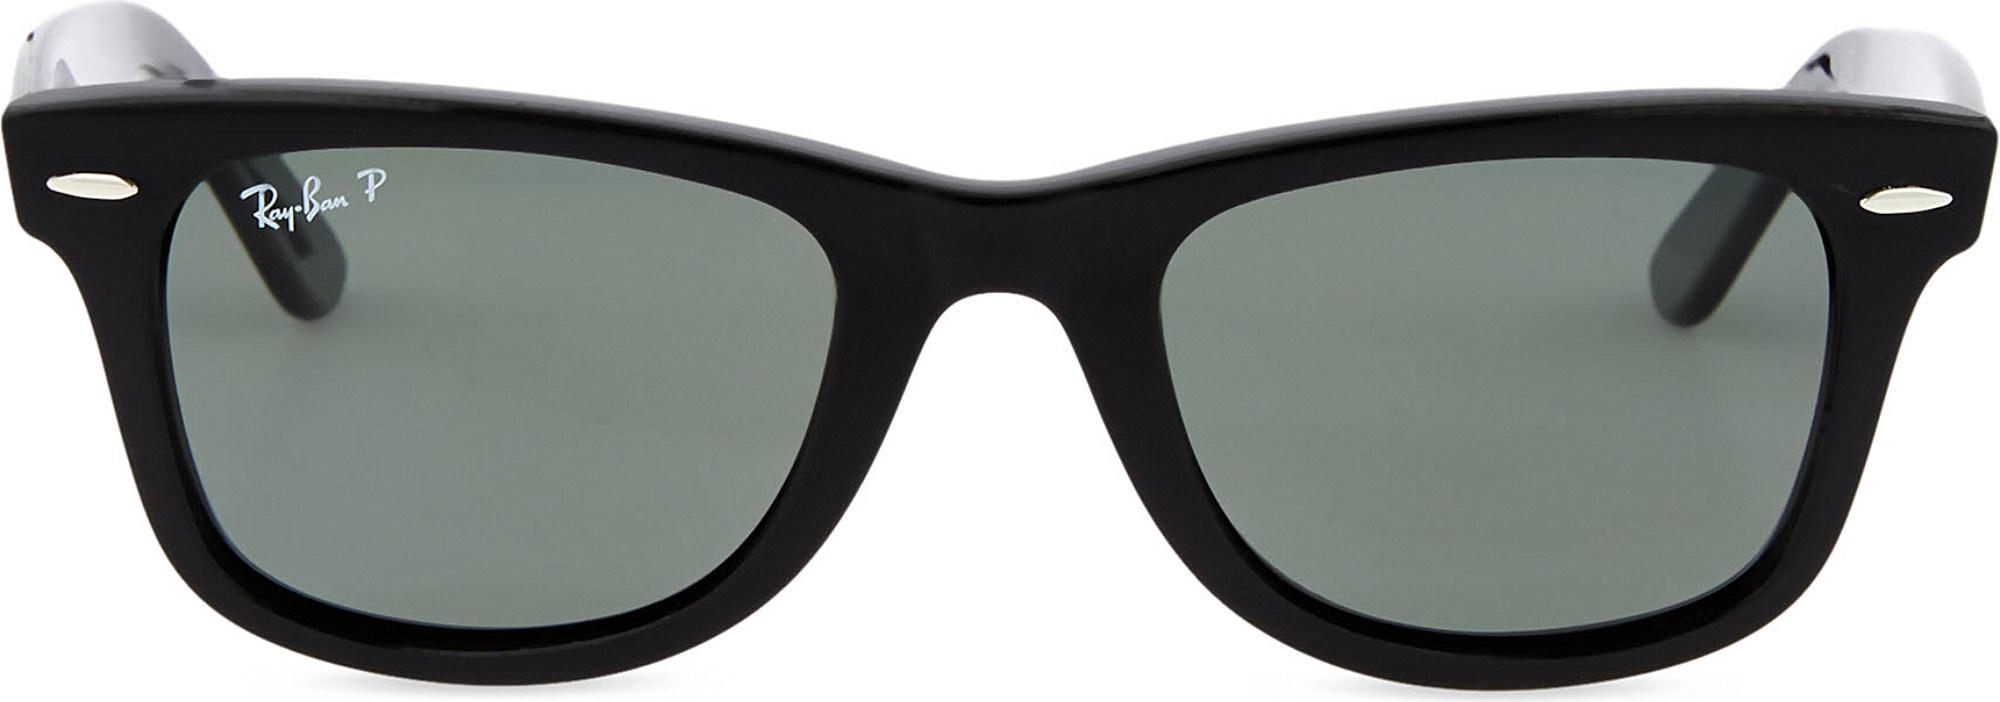 3c6380fce8 Lyst - Ray-Ban Black Thick Frame Wayfarer Sunglasses Rb2140 in Black